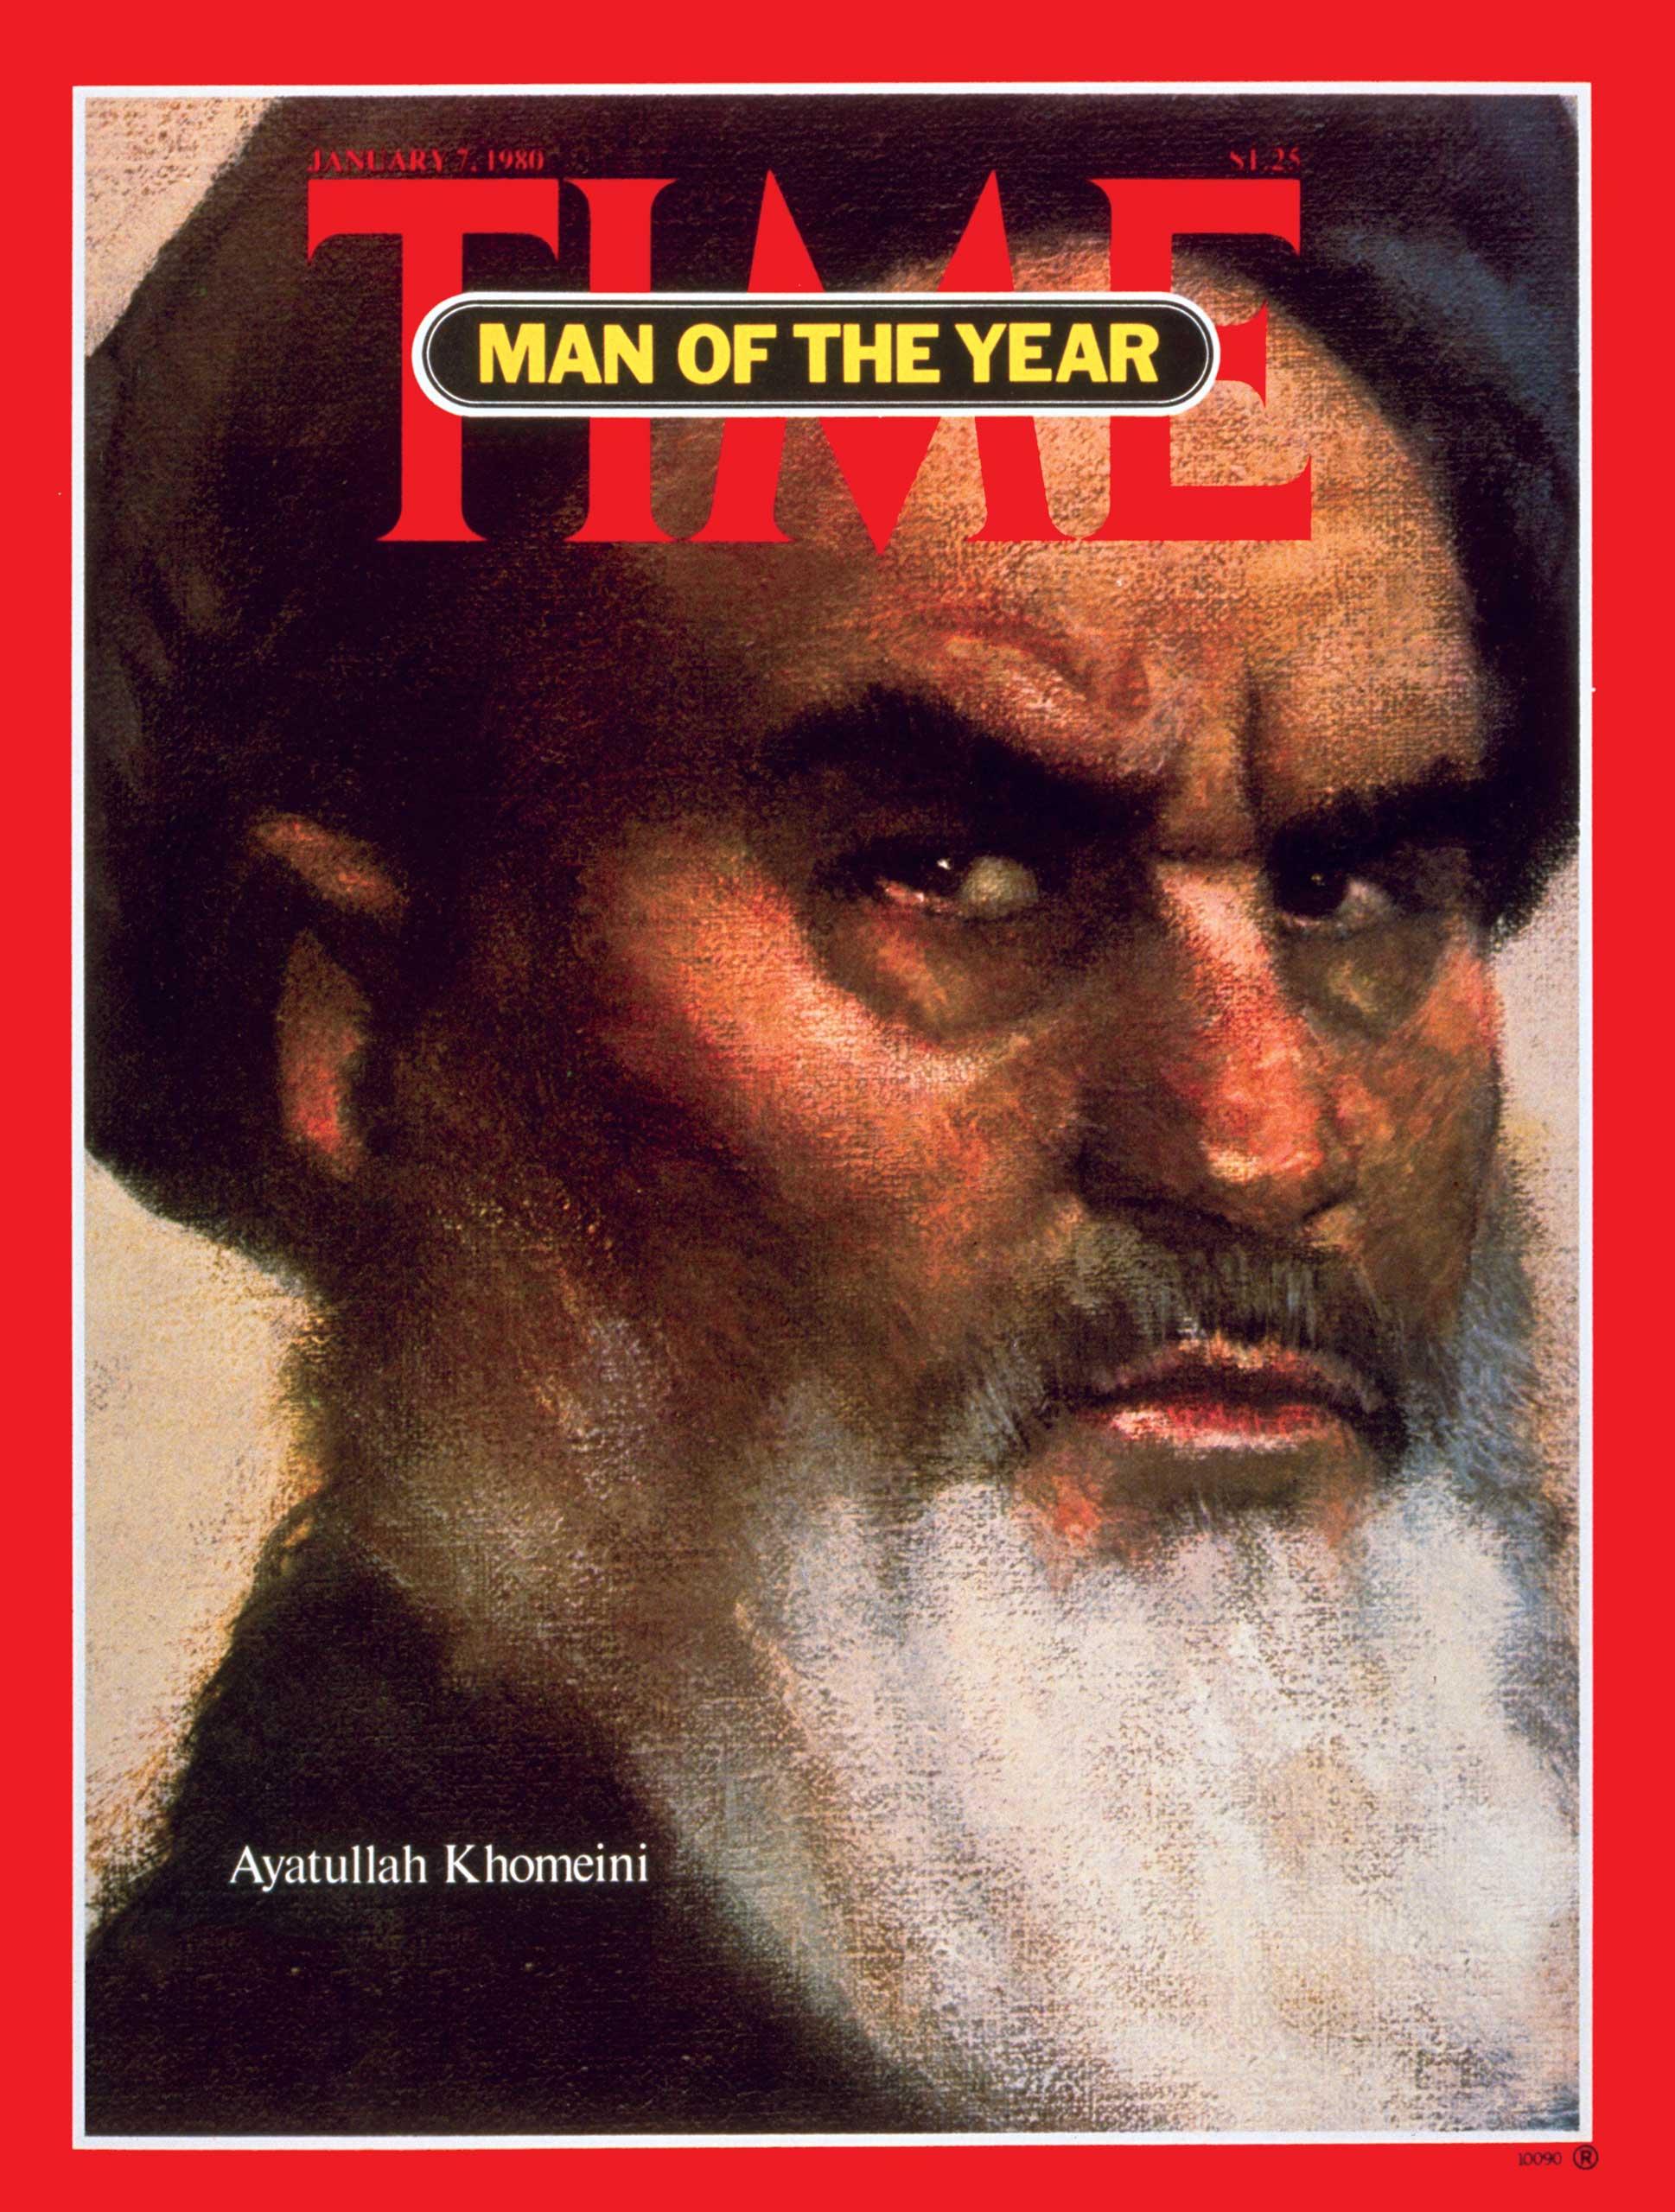 1979: Ayatollah Khomeini